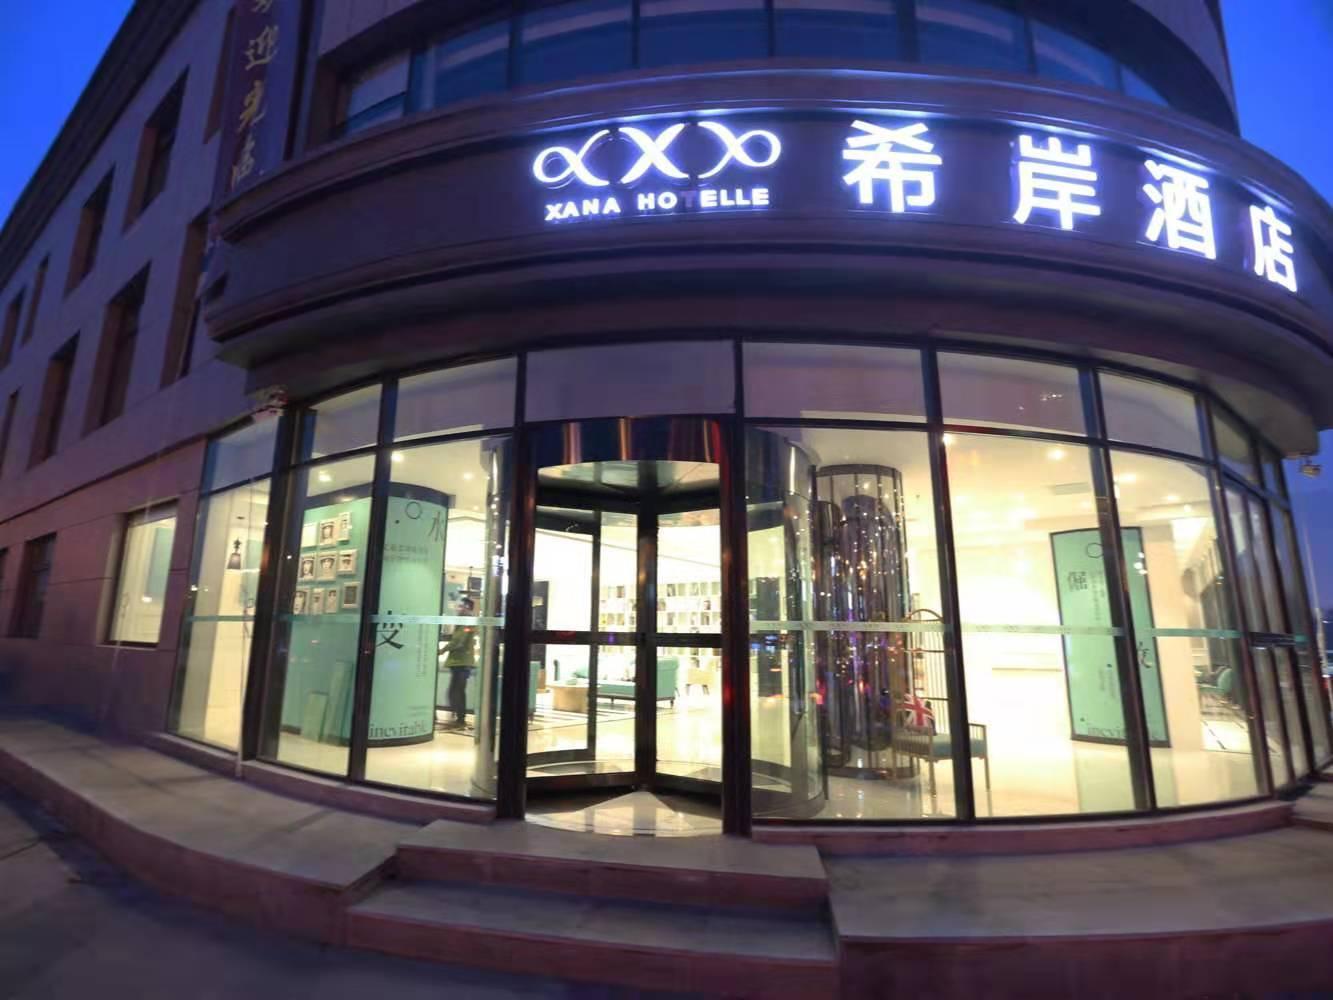 Xana Hotelle Zhongyang Nan Street Red Star Macalline